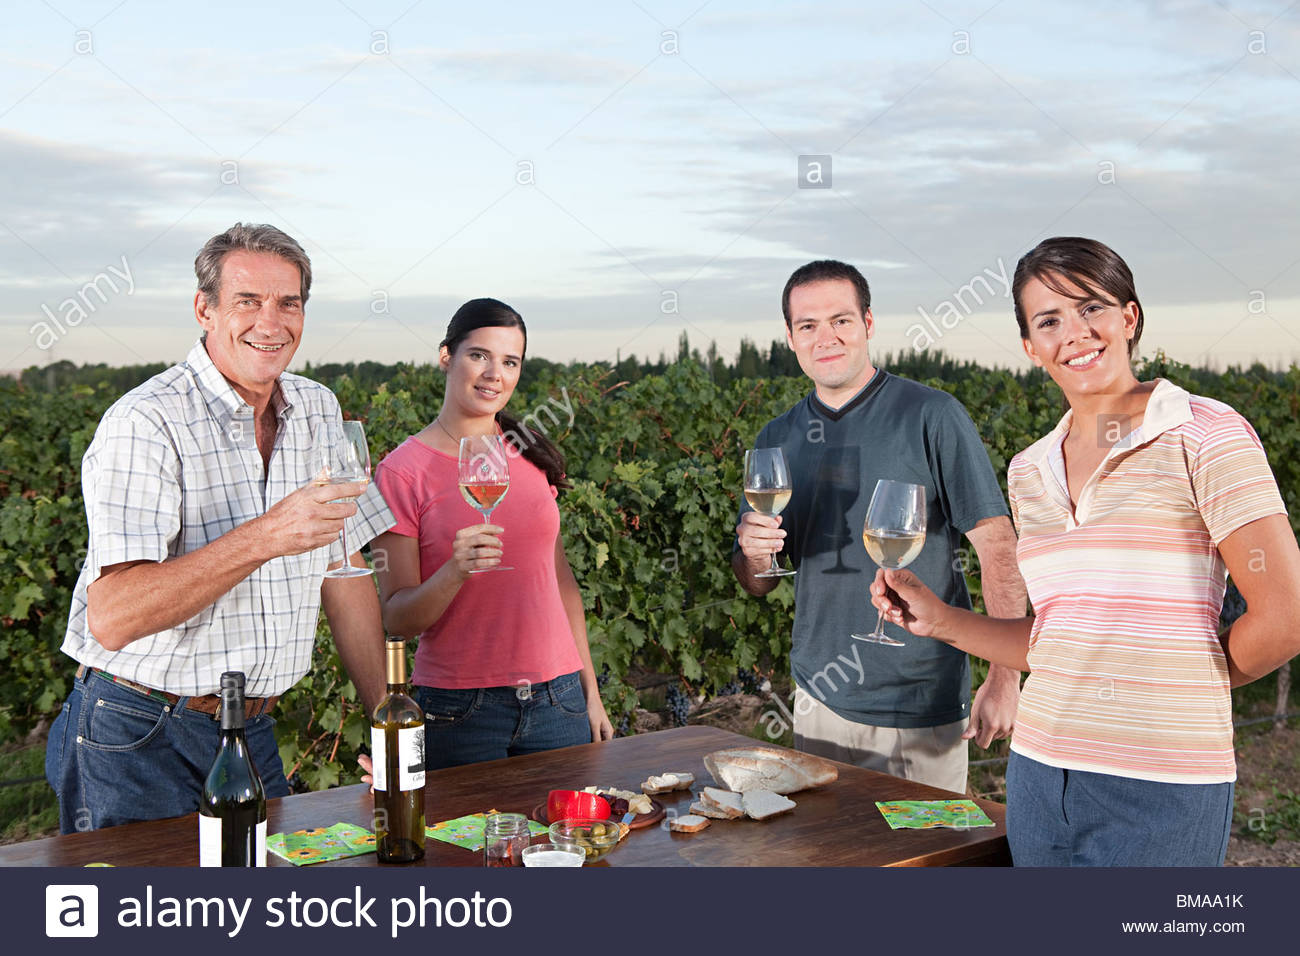 People wine tasting at vineyard - Stock Image